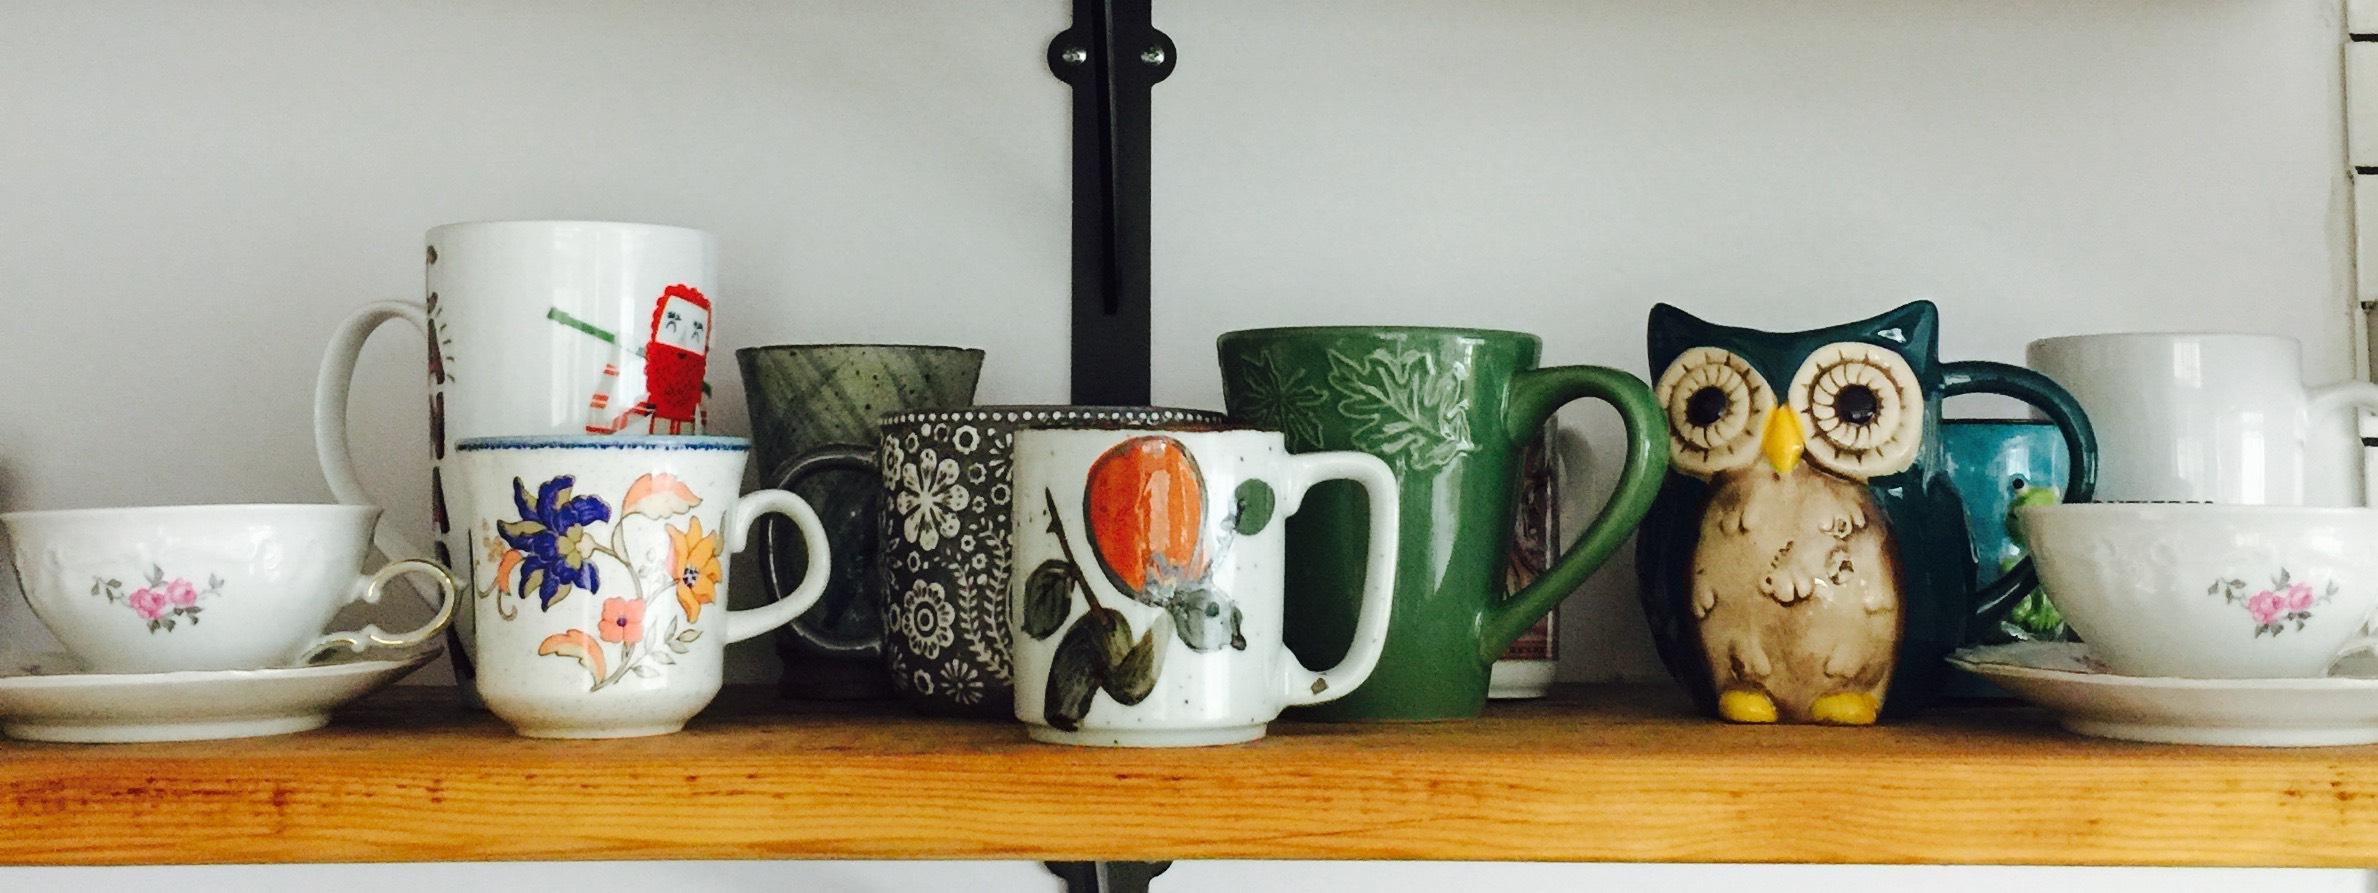 Little Green Lives -12 cups of tea